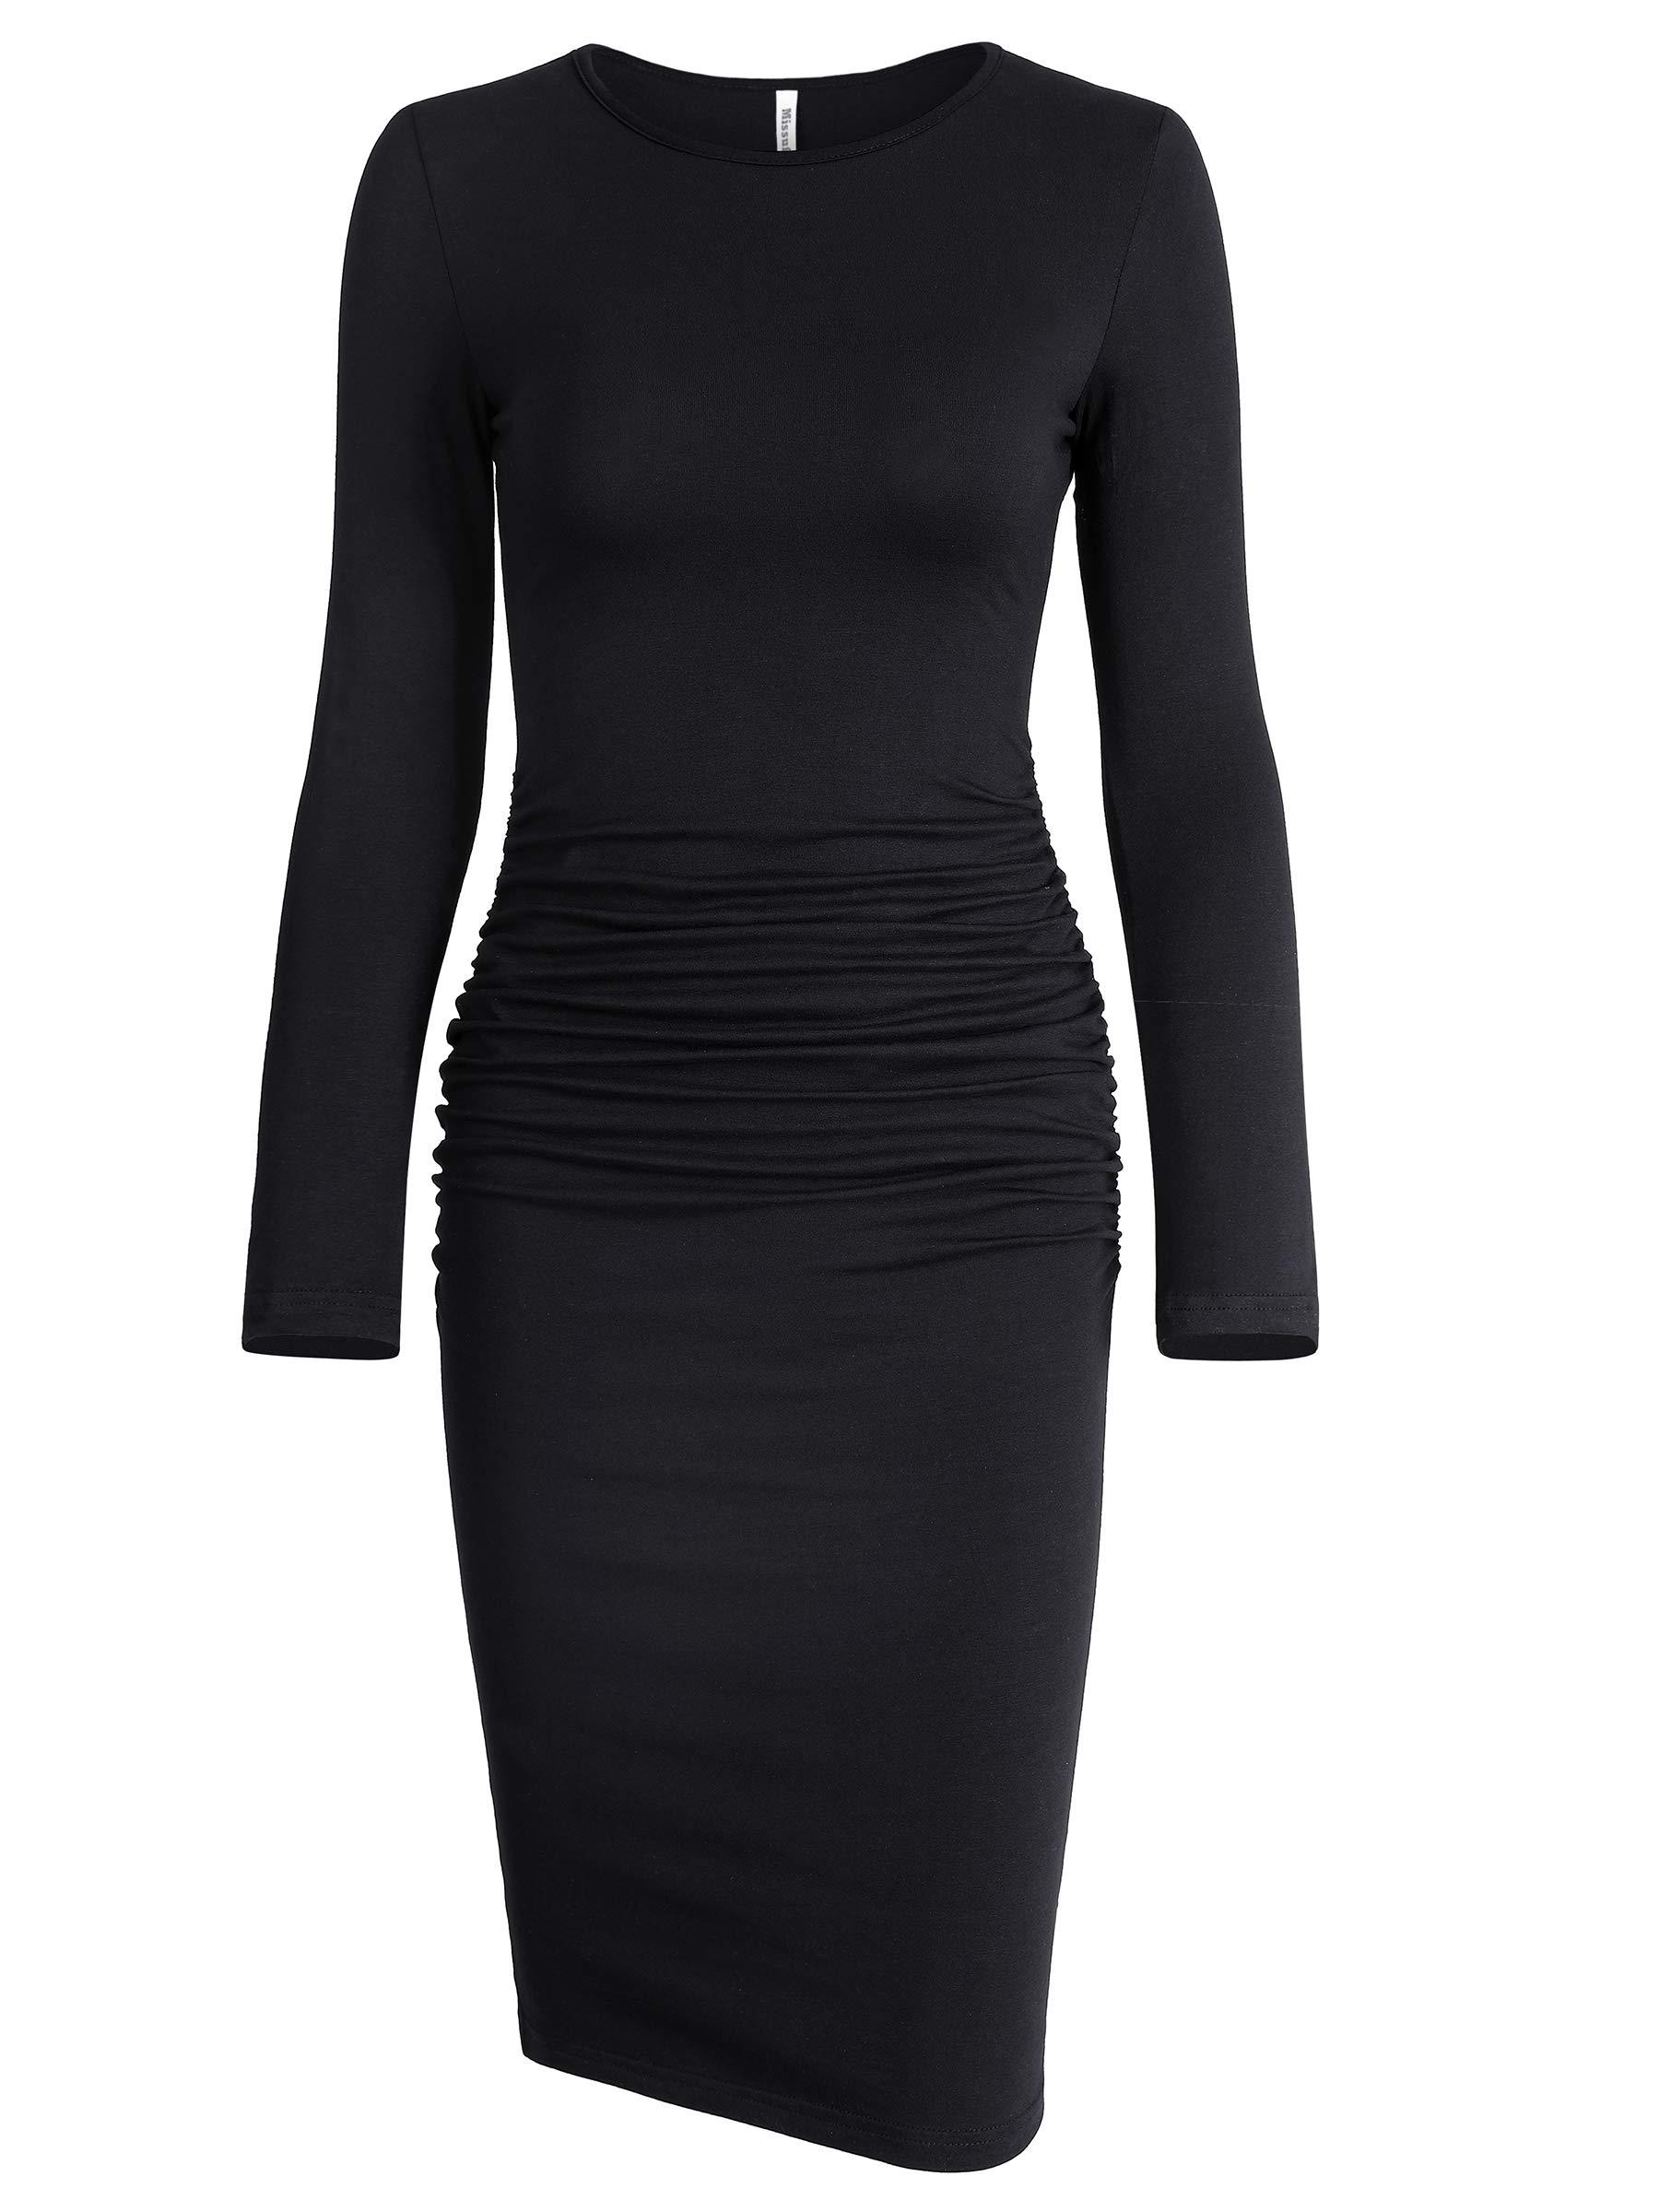 Missufe Women's Ruched Casual Sundress Midi Bodycon Sheath Dress (Medium, Long Sleeve Black)